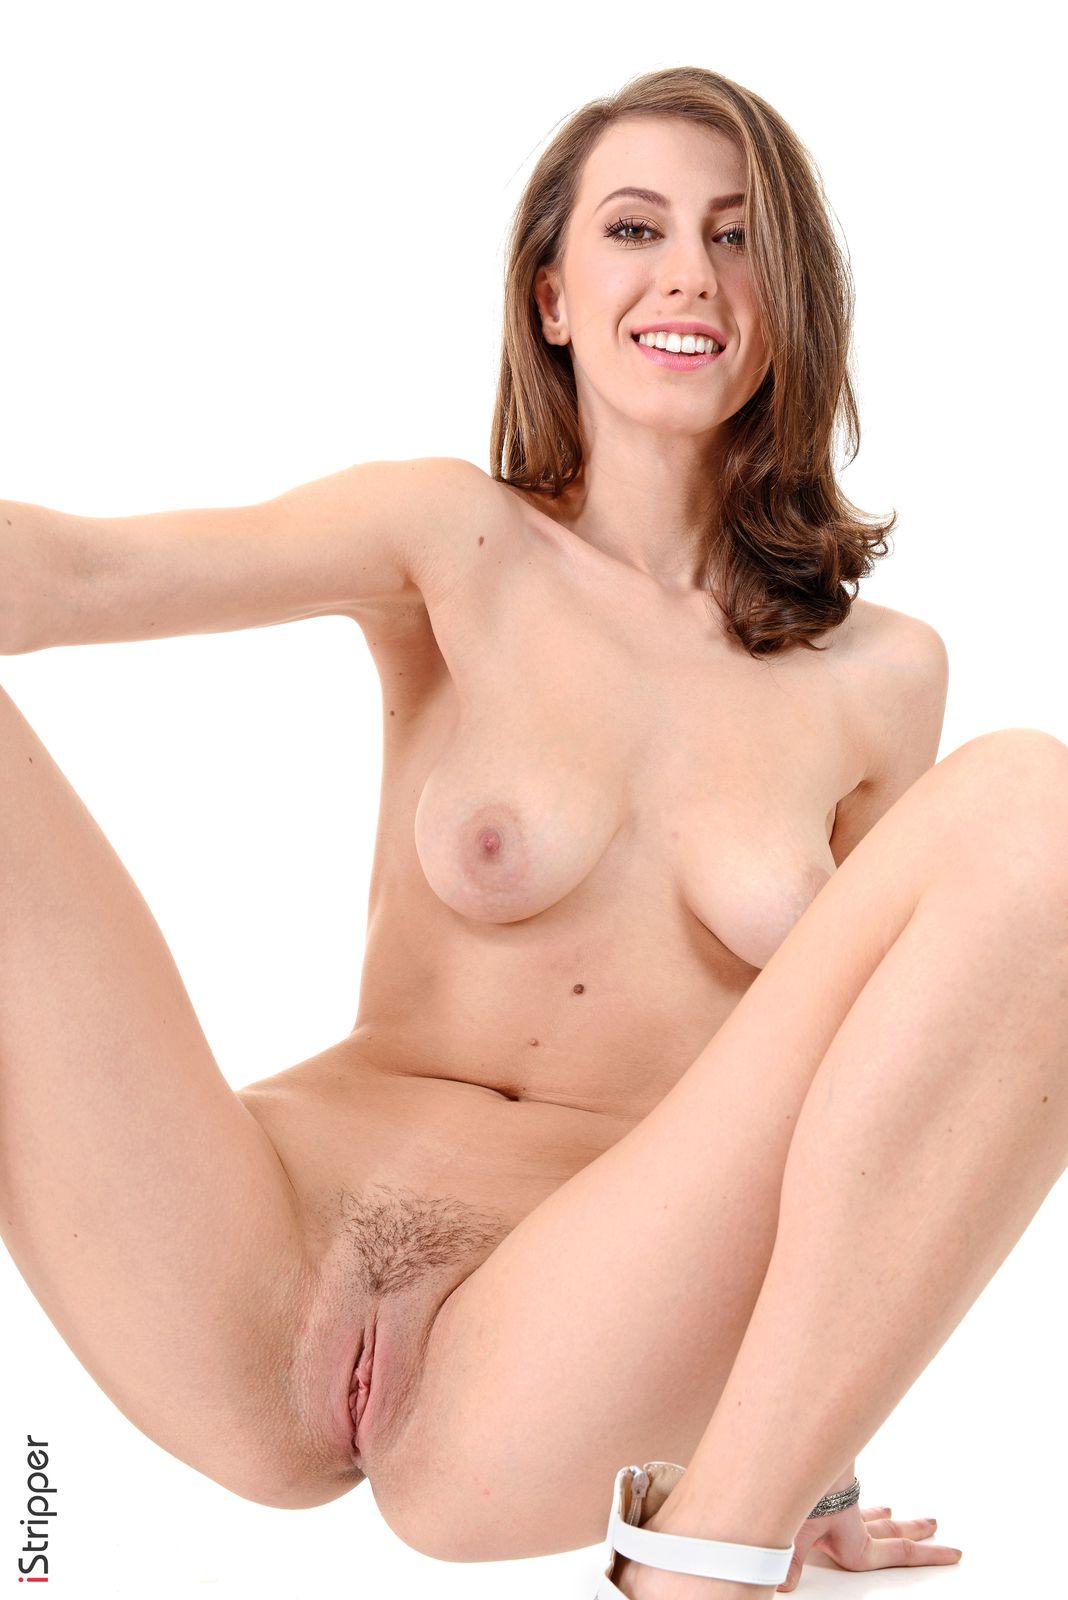 sexy girl on treadmill